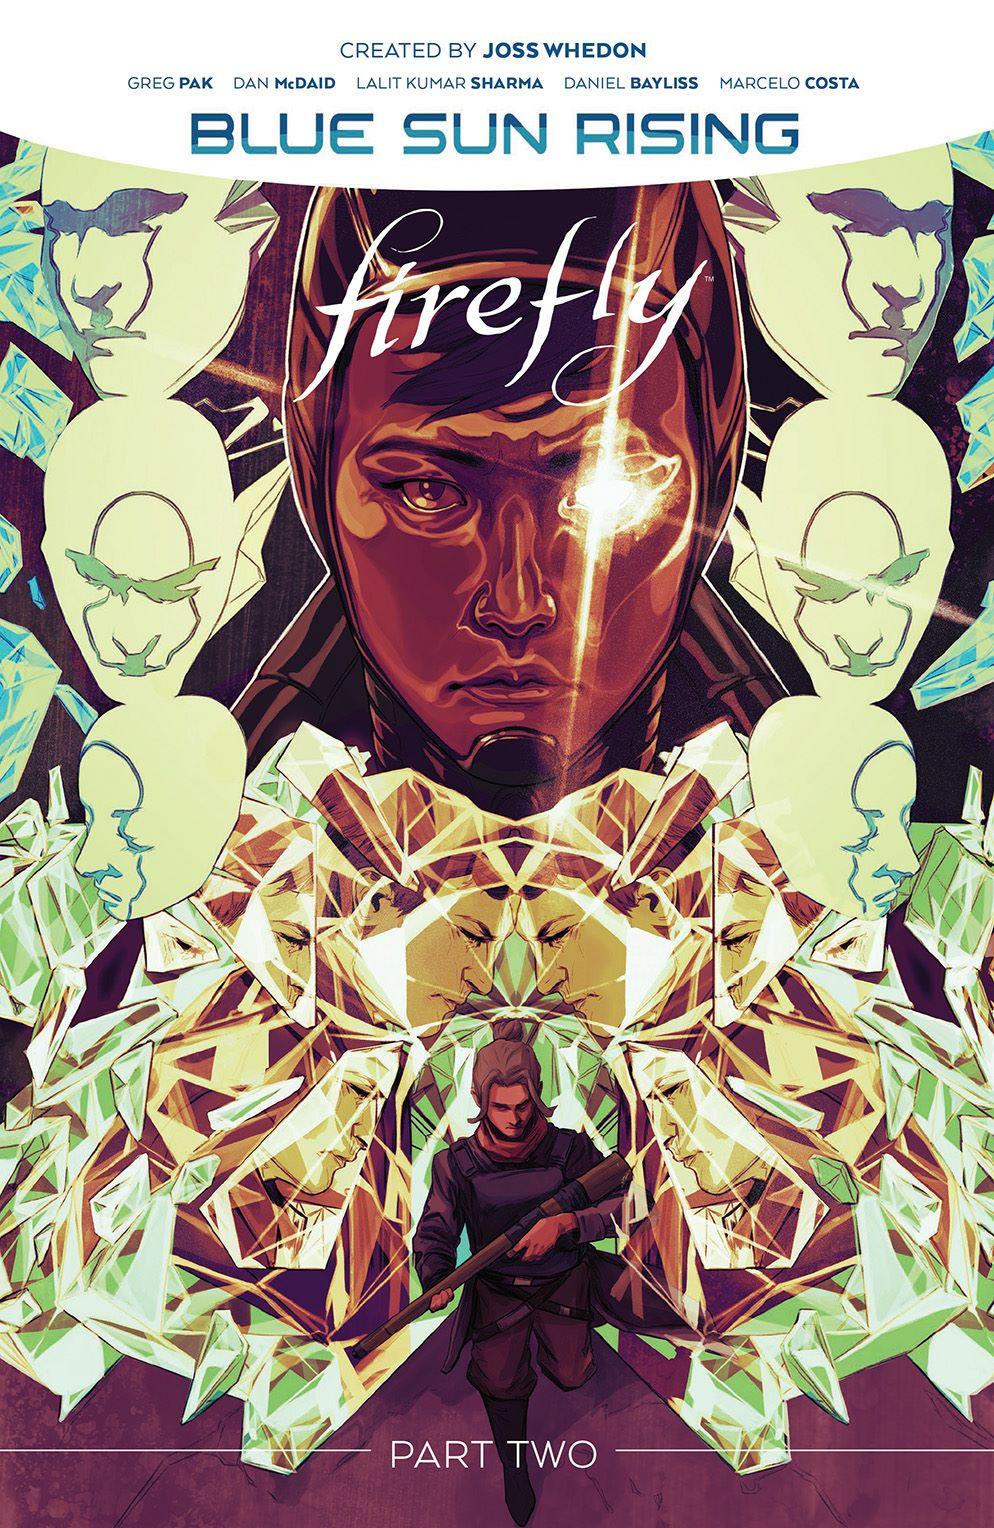 Firefly_BlueSunRising_v2_HC_Cover ComicList: BOOM! Studios New Releases for 05/12/2021